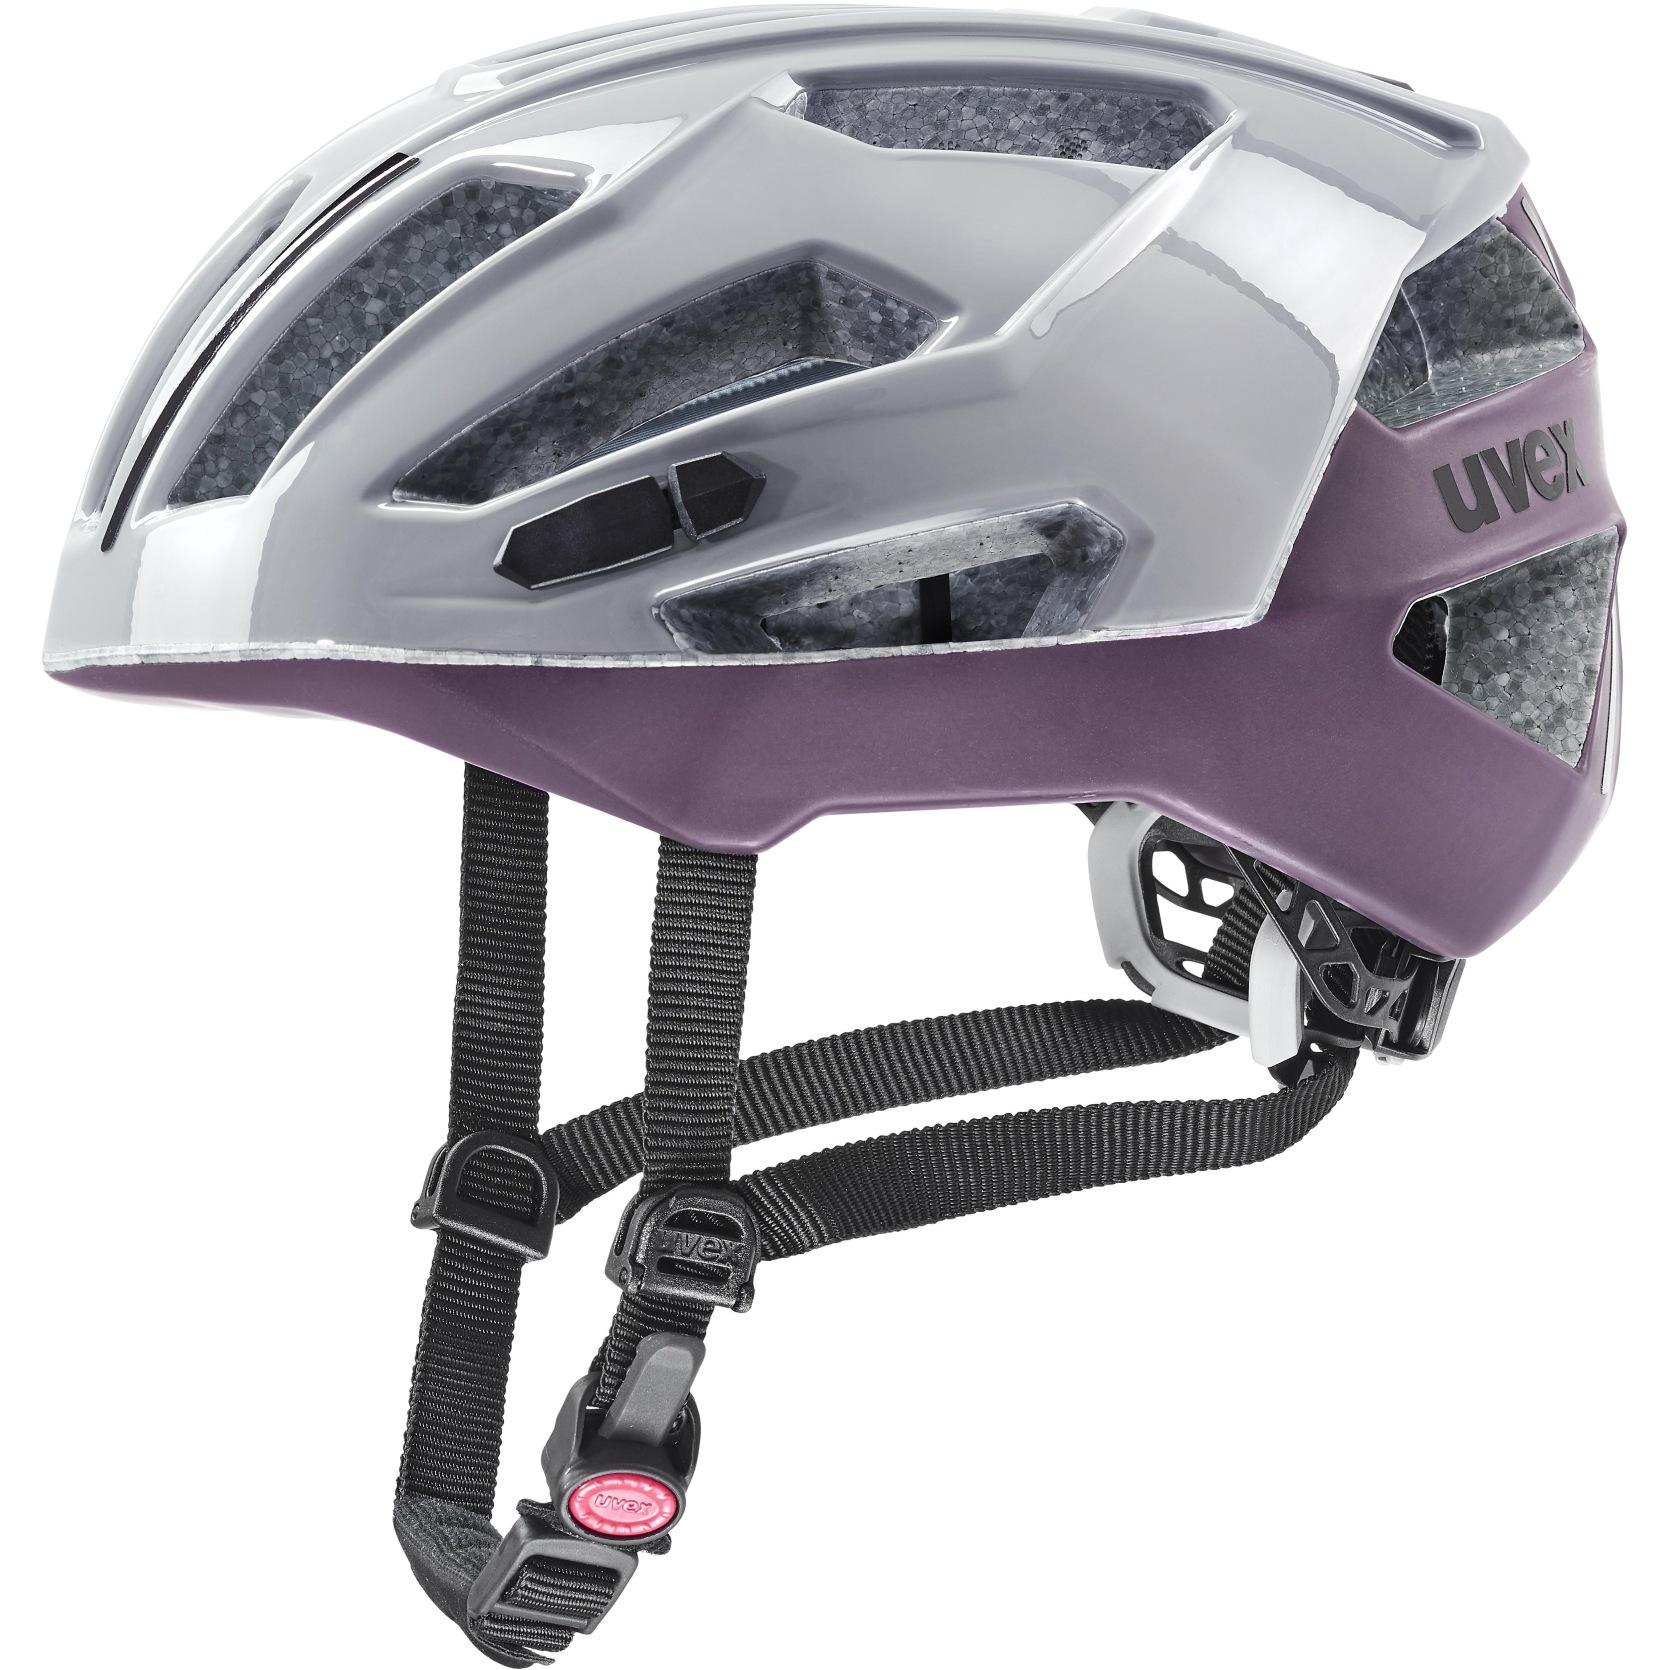 Image of Uvex gravel-x Helmet - rhino-plum